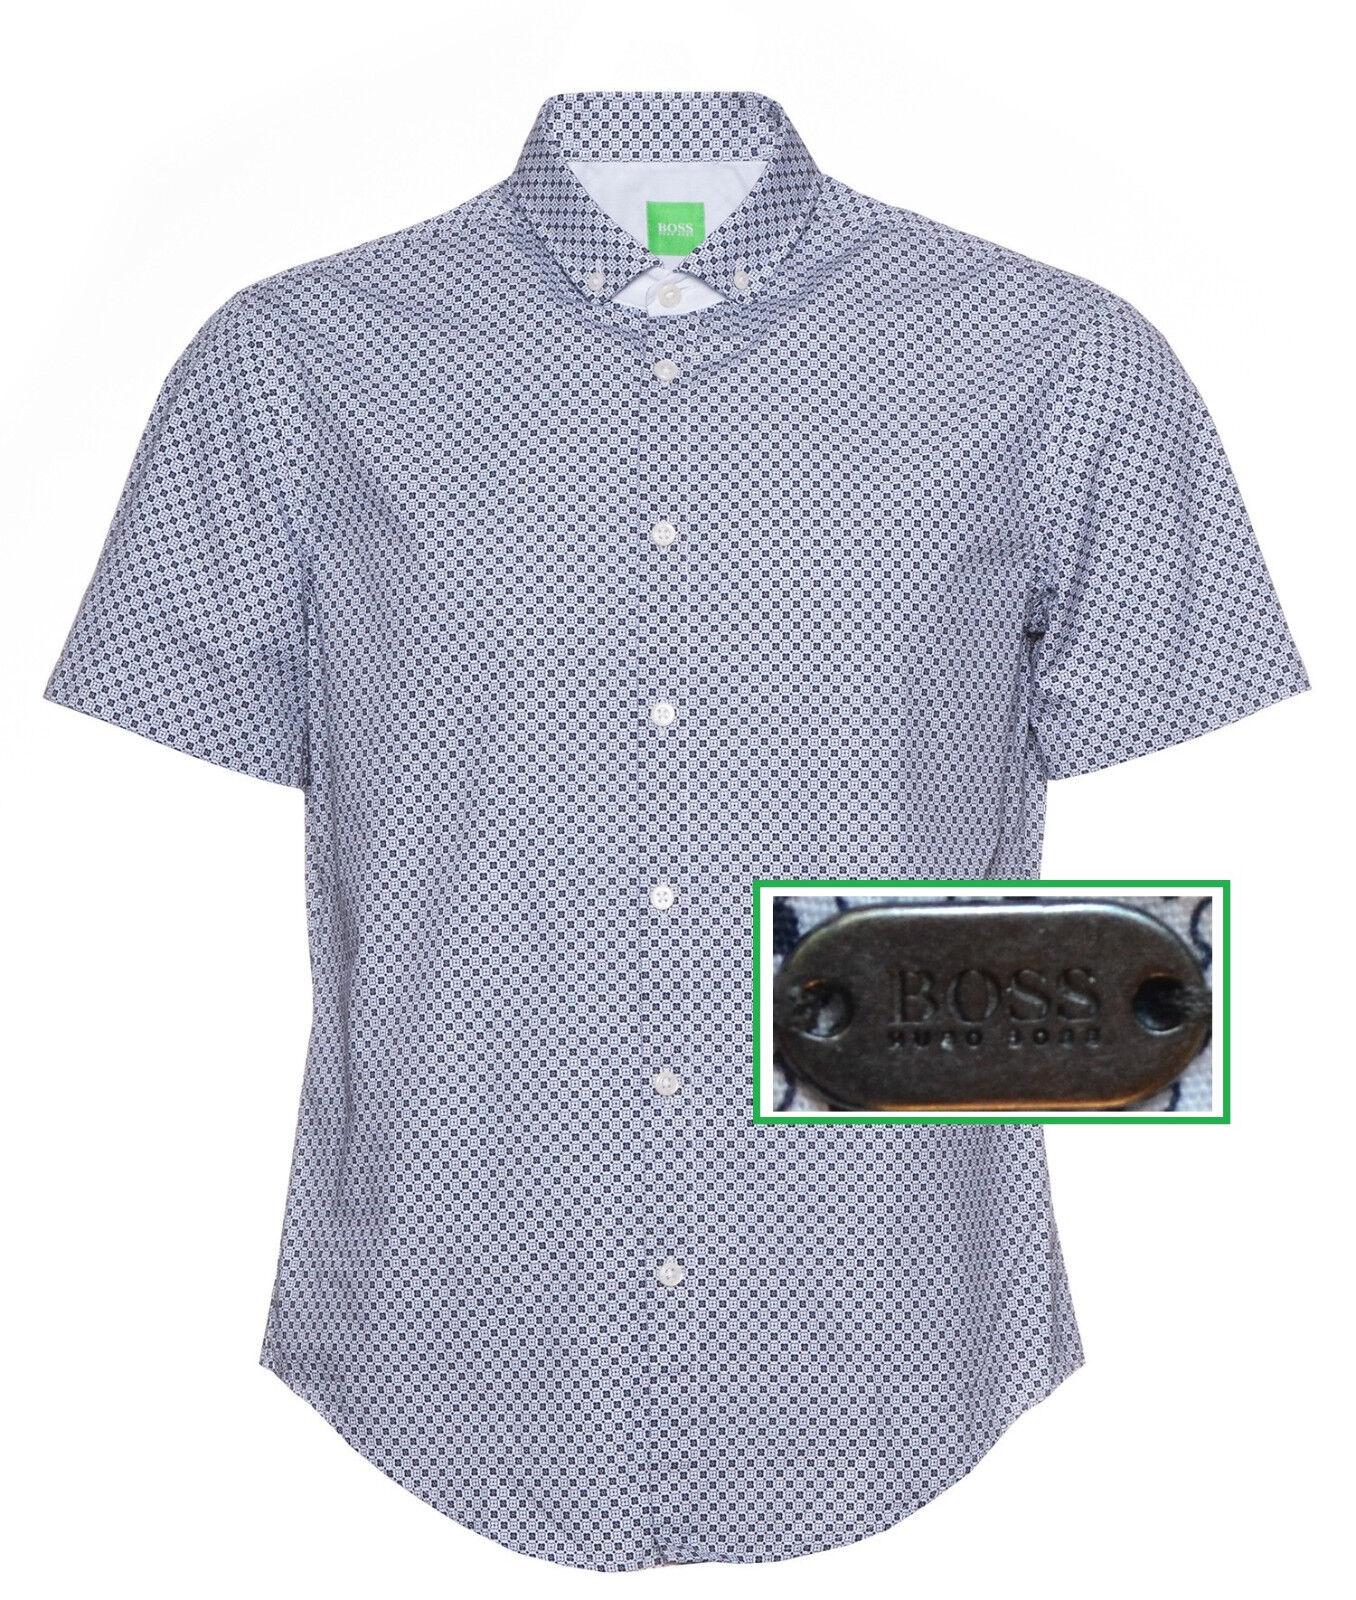 NWT Hugo Boss Green Label By Hugo Boss Slim Fit Geometric Printed Sport Shirt